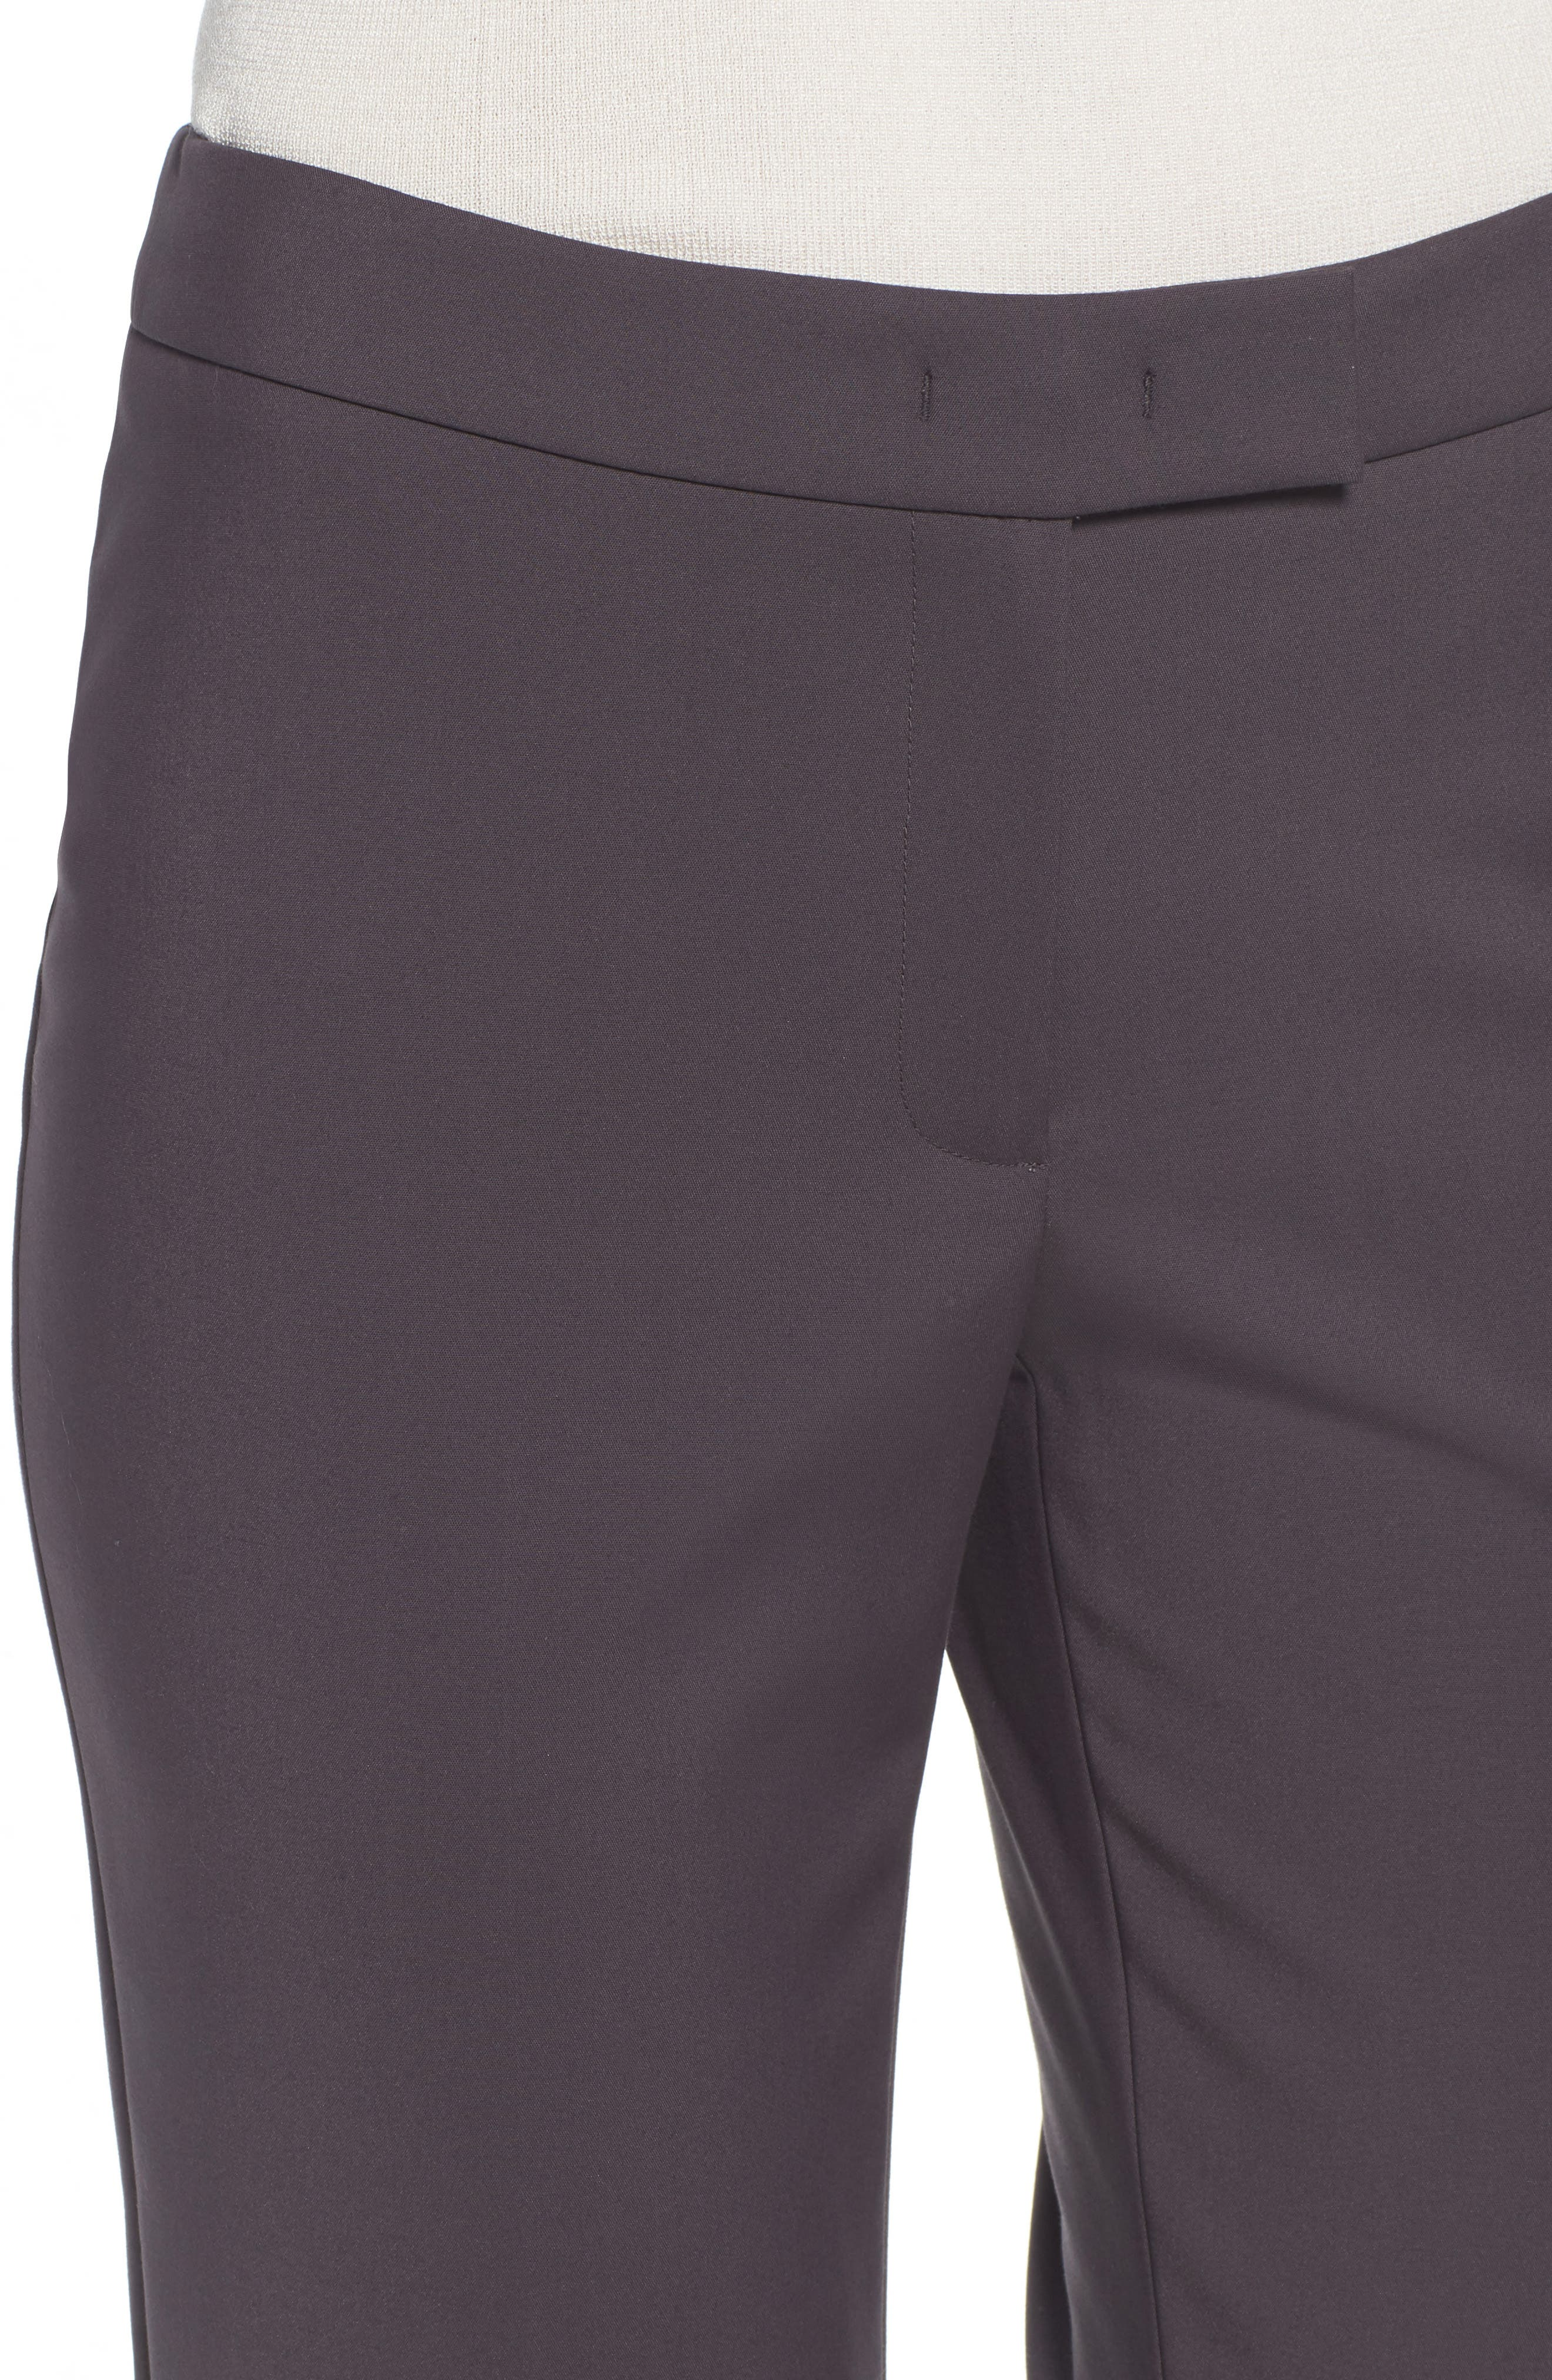 Slim Ankle Pants,                             Alternate thumbnail 4, color,